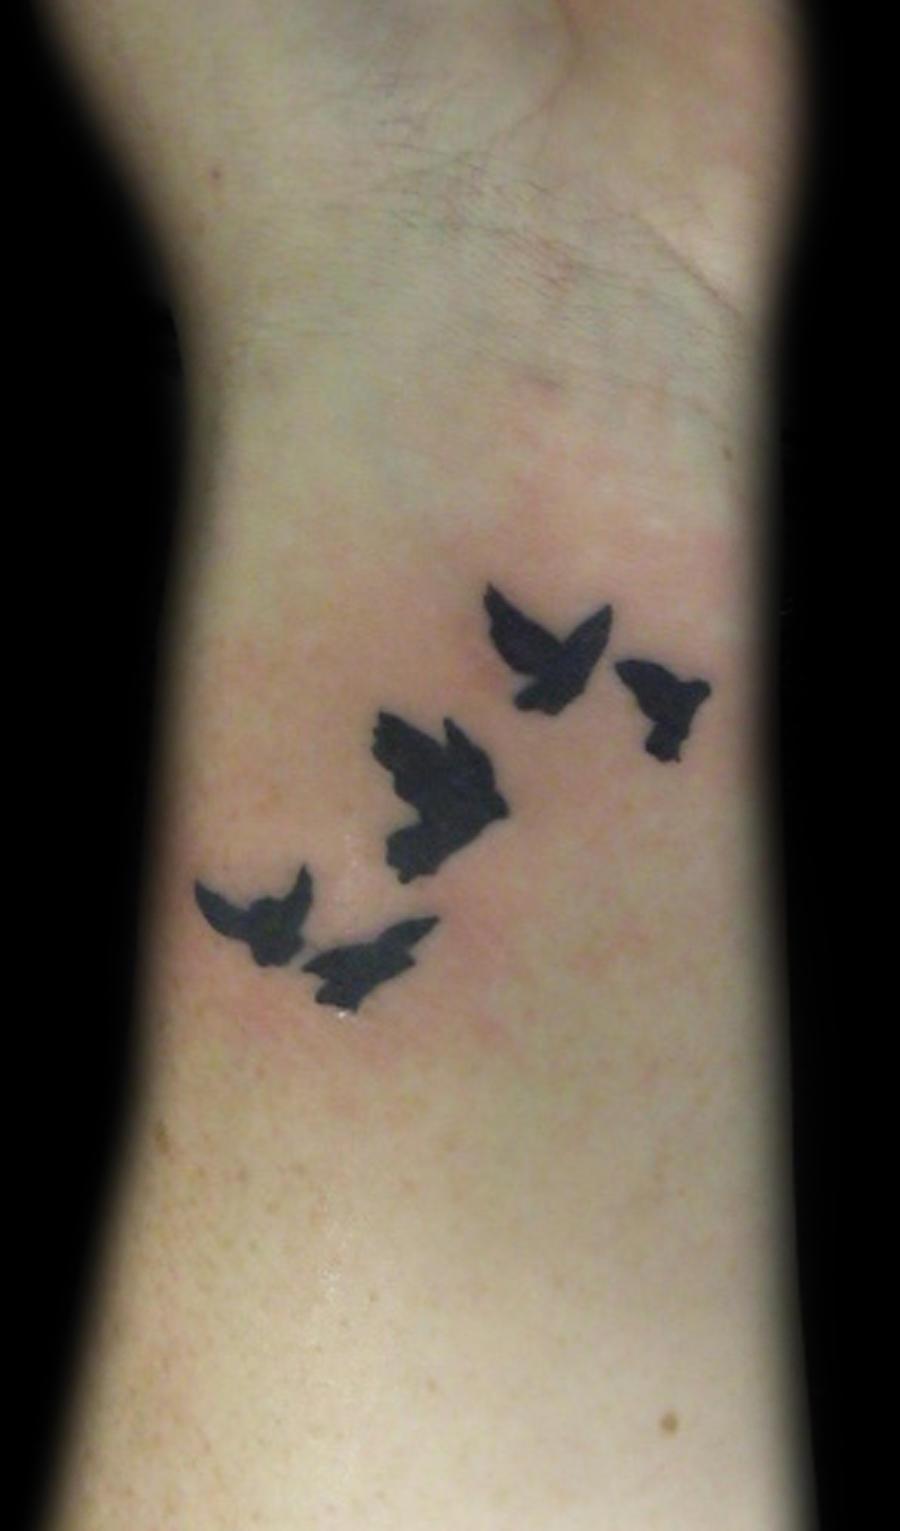 Wrist birds by nailzvandiggele on deviantart for Bird tattoos on wrist